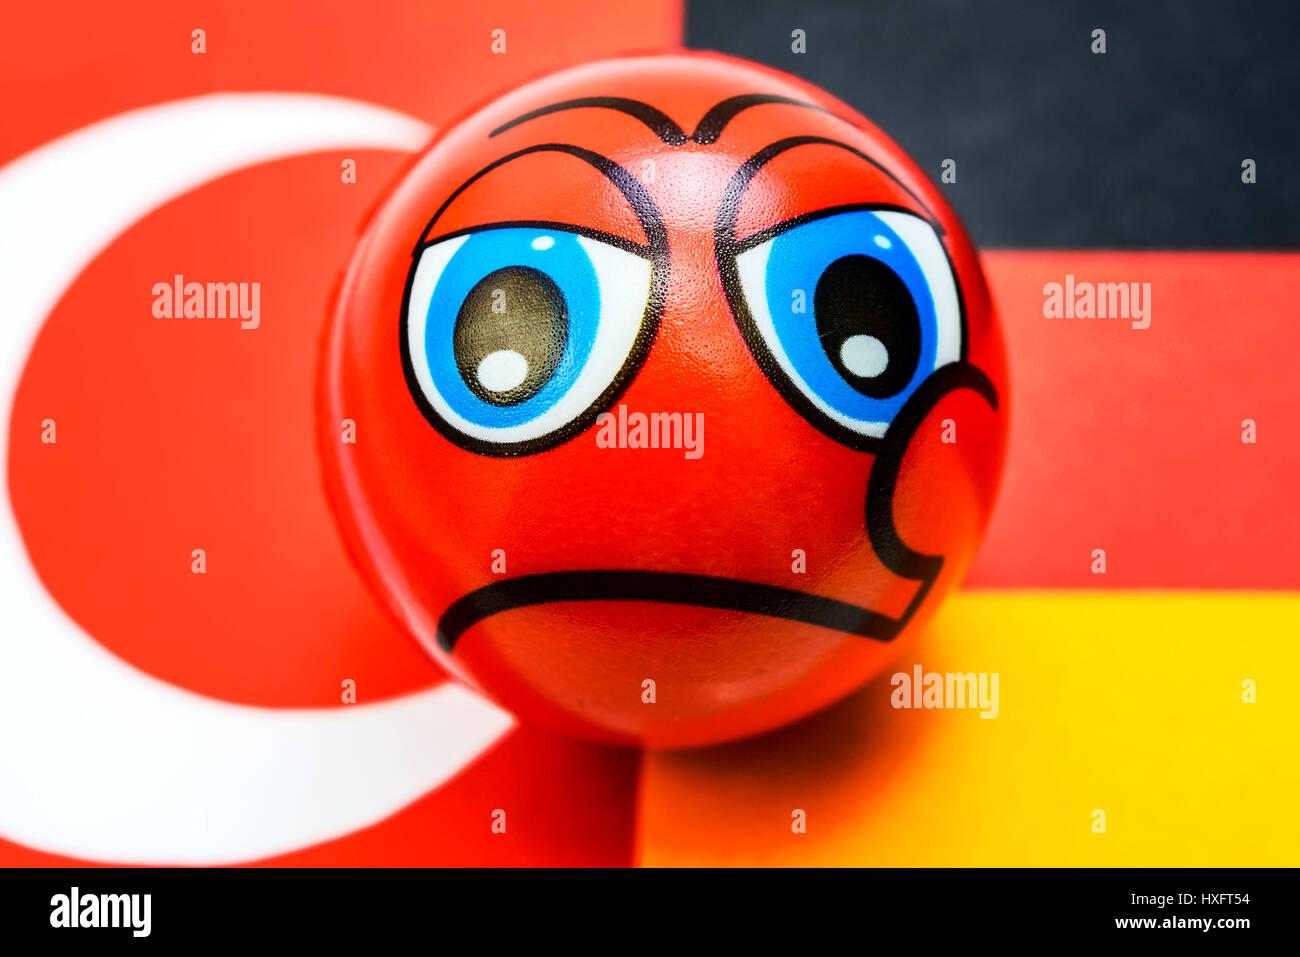 Flags of Germany and Turkey with Schlechter-Laune-Smiley, crisis in the German Turkish relations, Fahnen von Deutschland Stock Photo